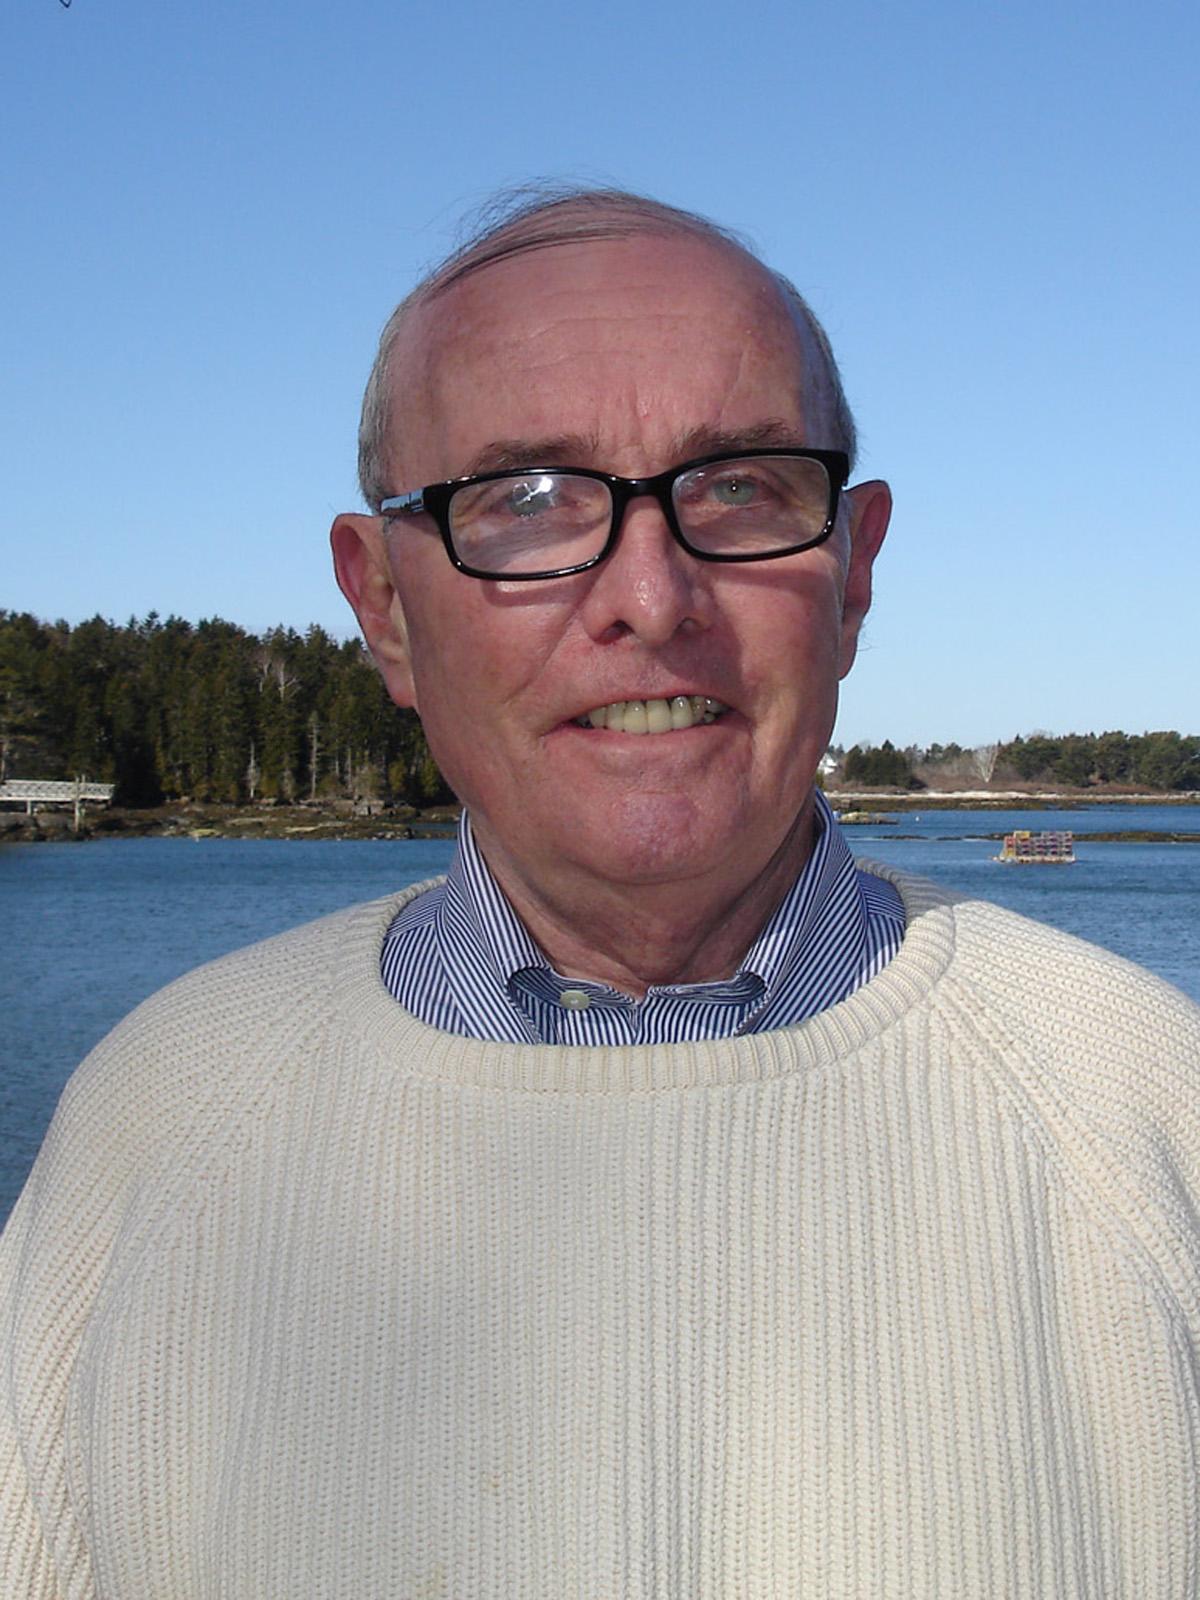 Dennis Duggan